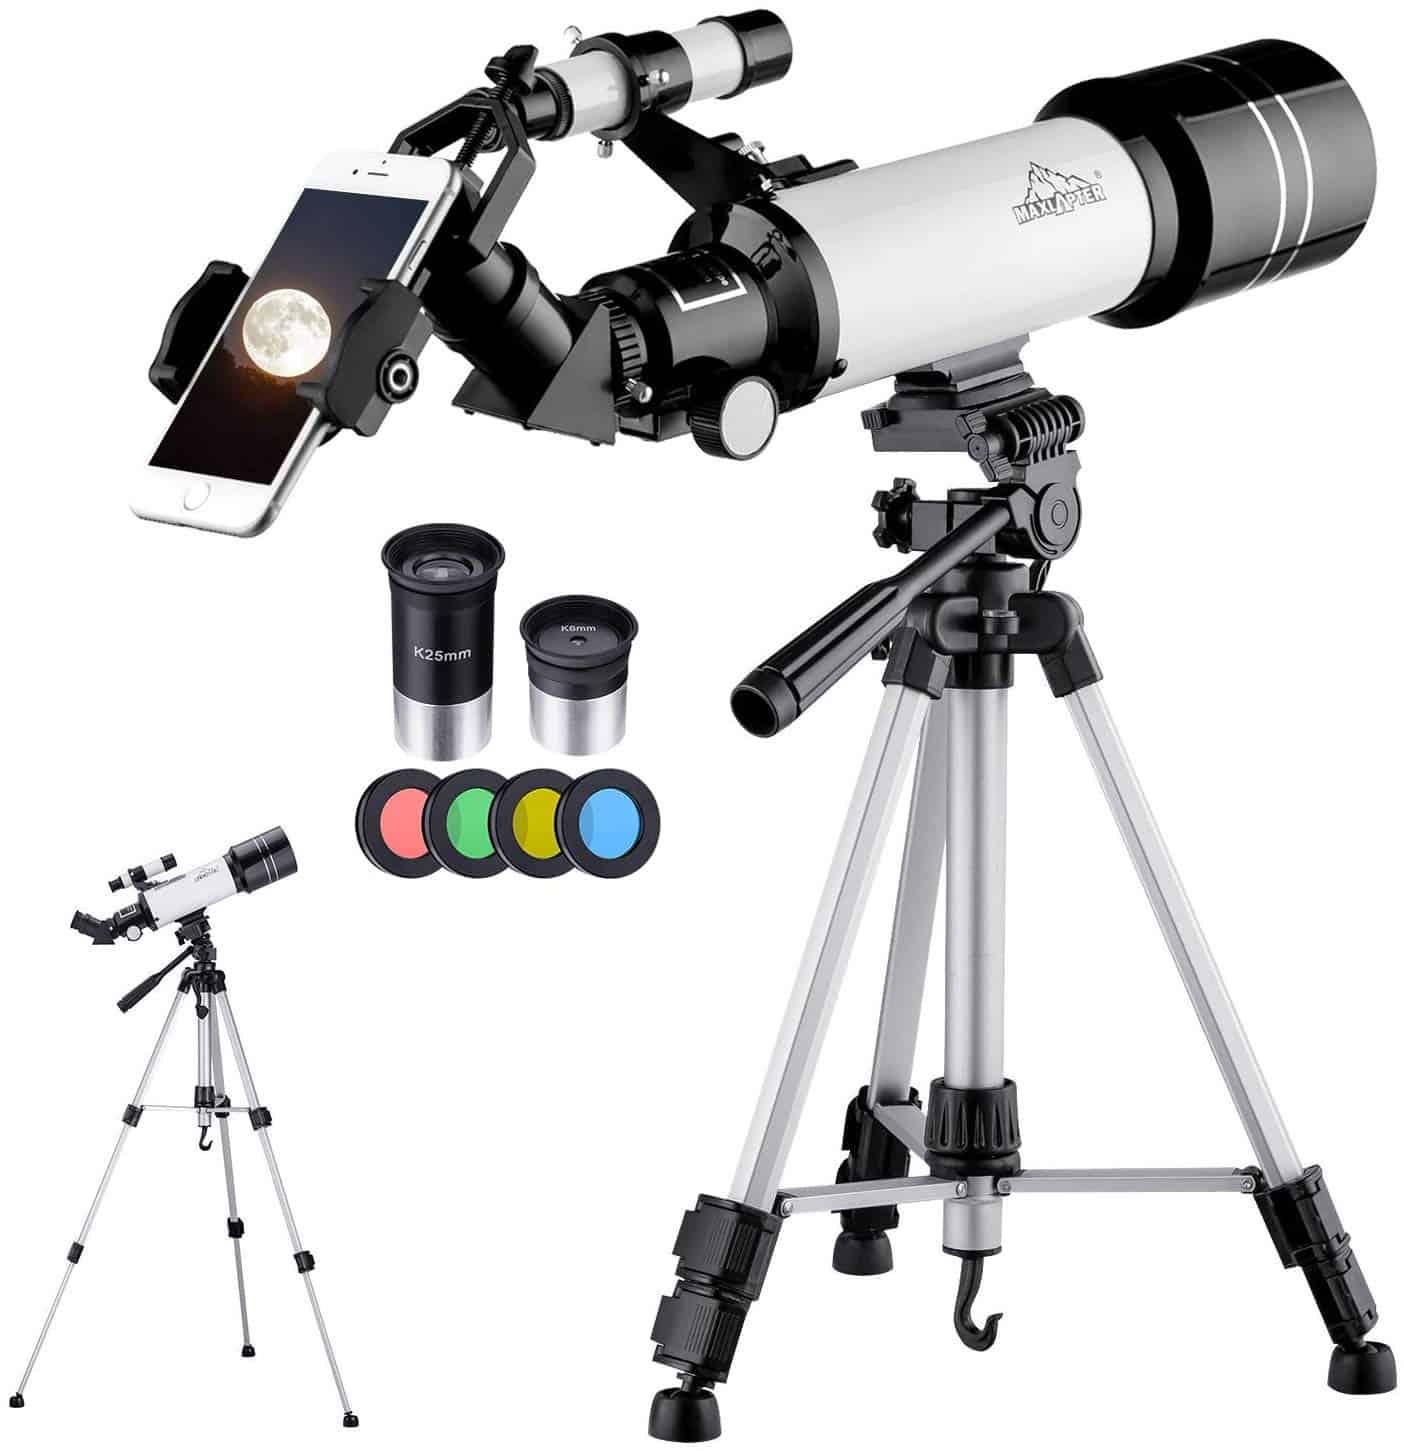 MAXLAPTER Telescope for Kids and Beginners